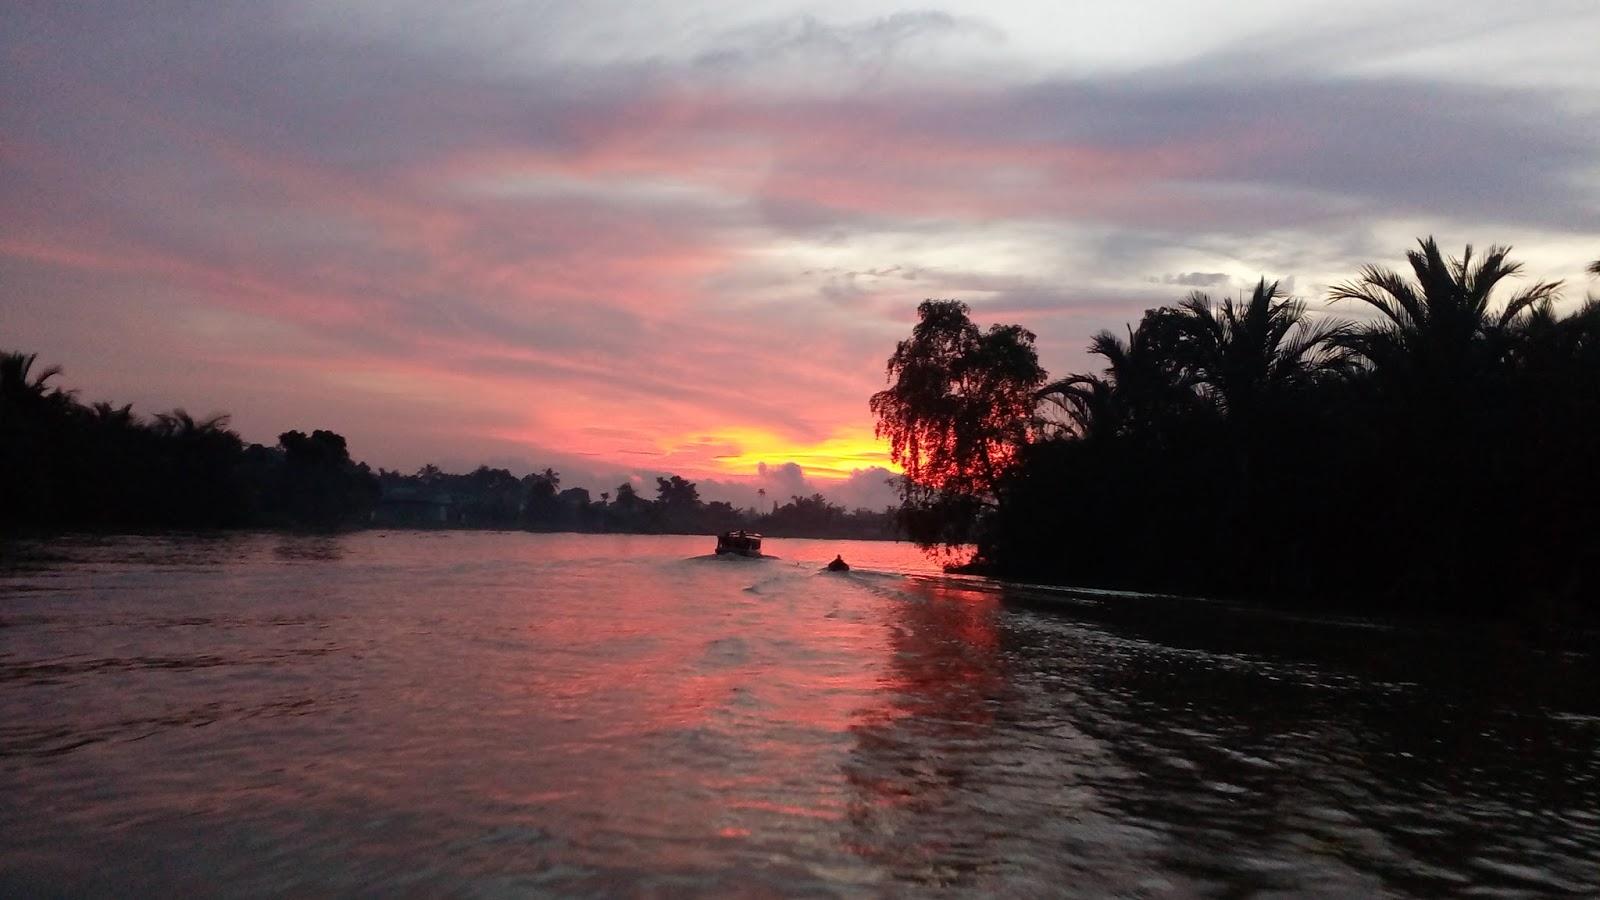 Menilik Pasar Terapung Lok Baintan Warisan Budaya Kesultanan Banjar Panorama